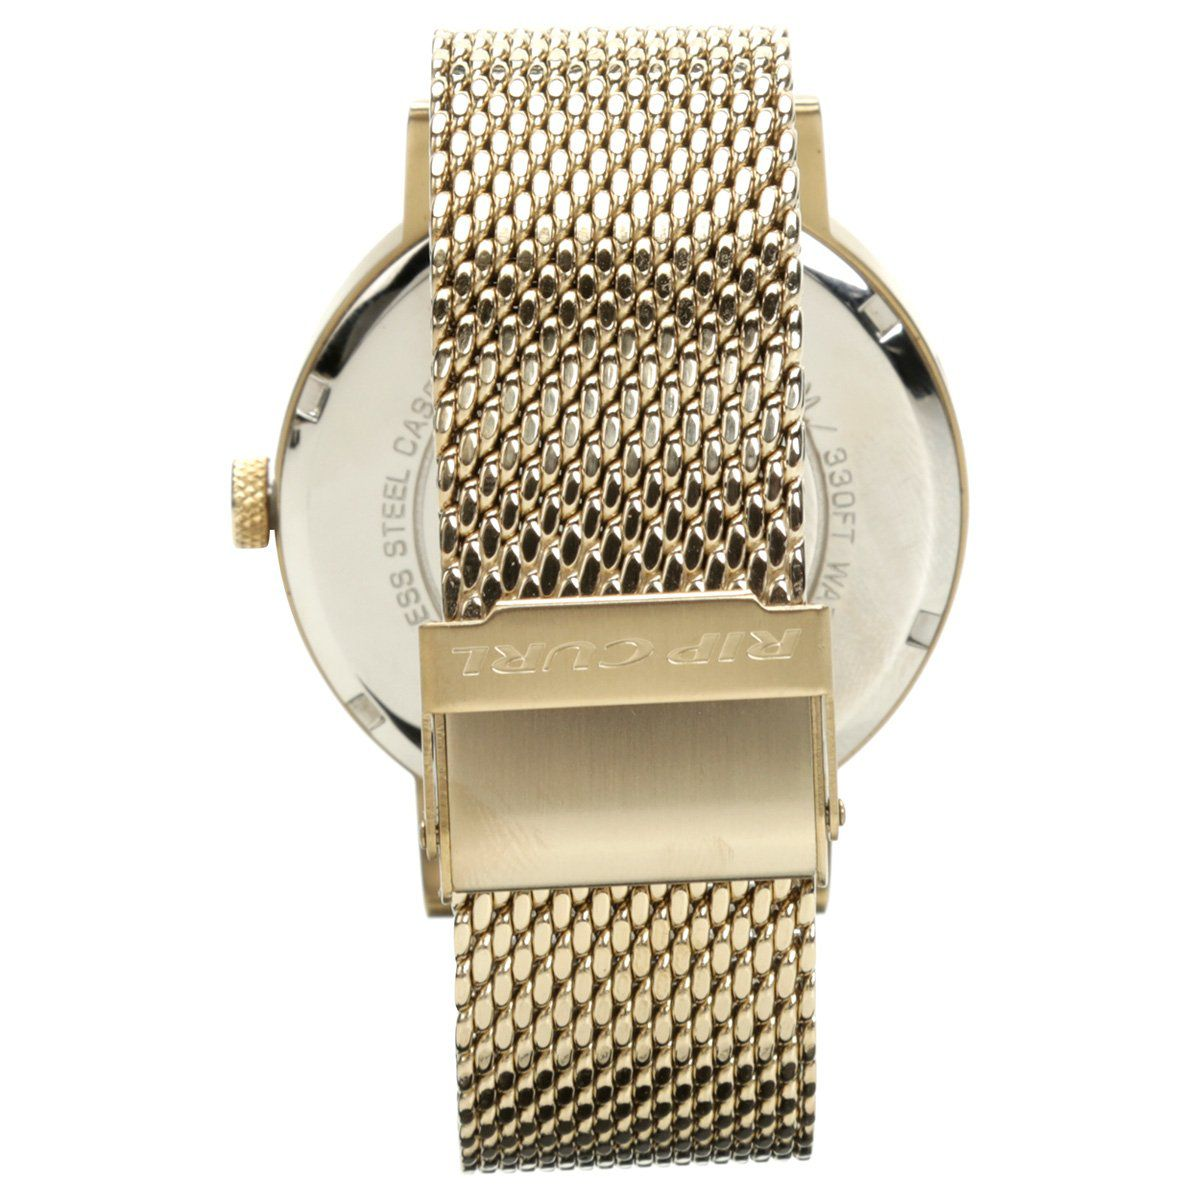 Relógio Rip Curl Circa Gold